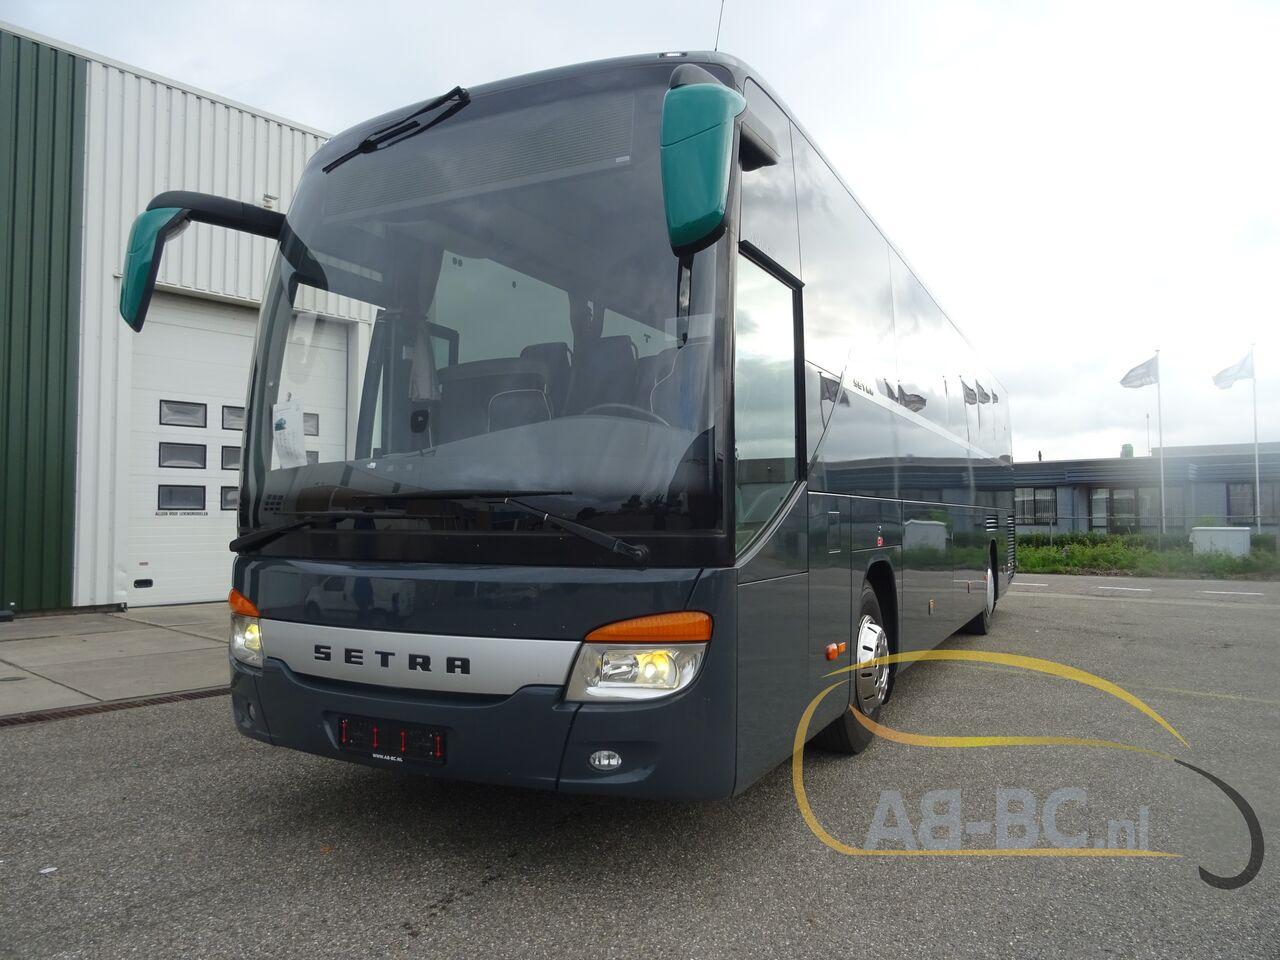 coach-busSETRA-S415-GT-HD-FINAL-EDITION---1627456976477195427_big_1e08c46485e728fed848f25c20ec93ef--21050713010665719300